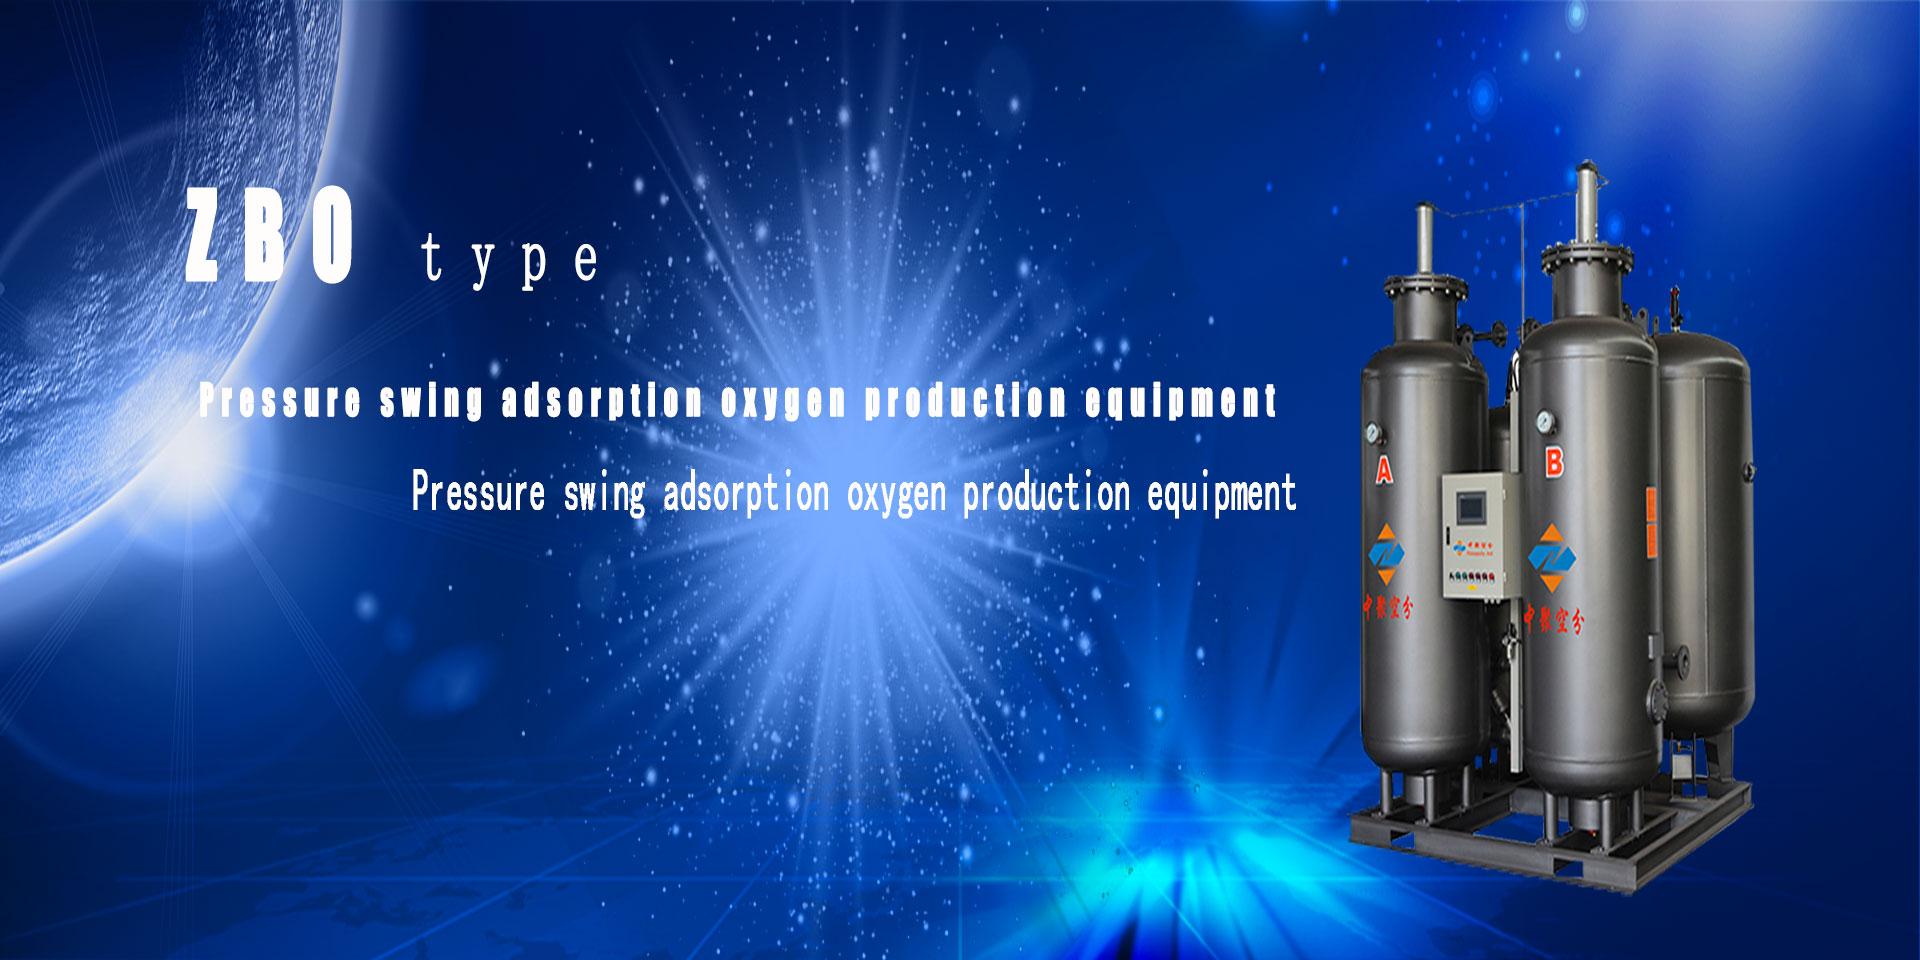 Air separation equipment manufacturers, air separation equipment manufacturing, air separation equipment production